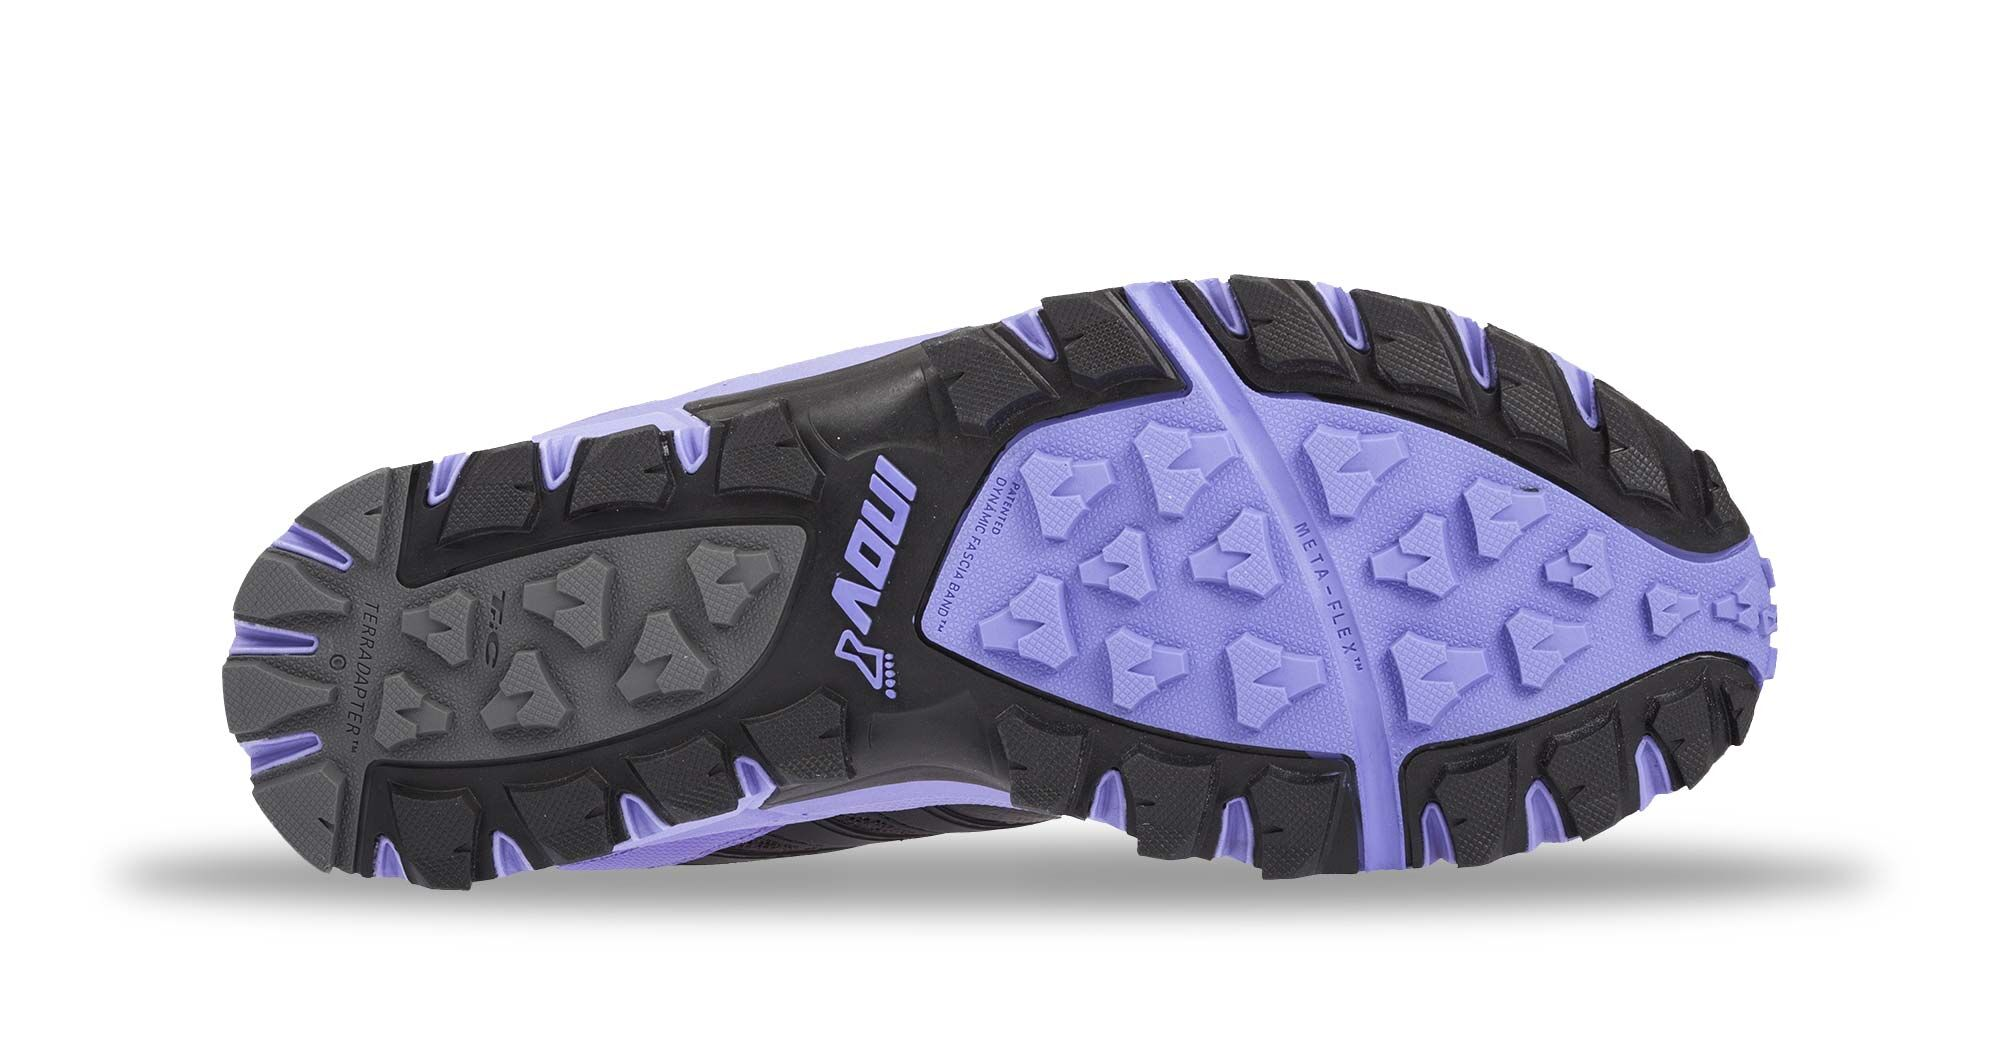 Trailtalon 290 Women's Running Shoe